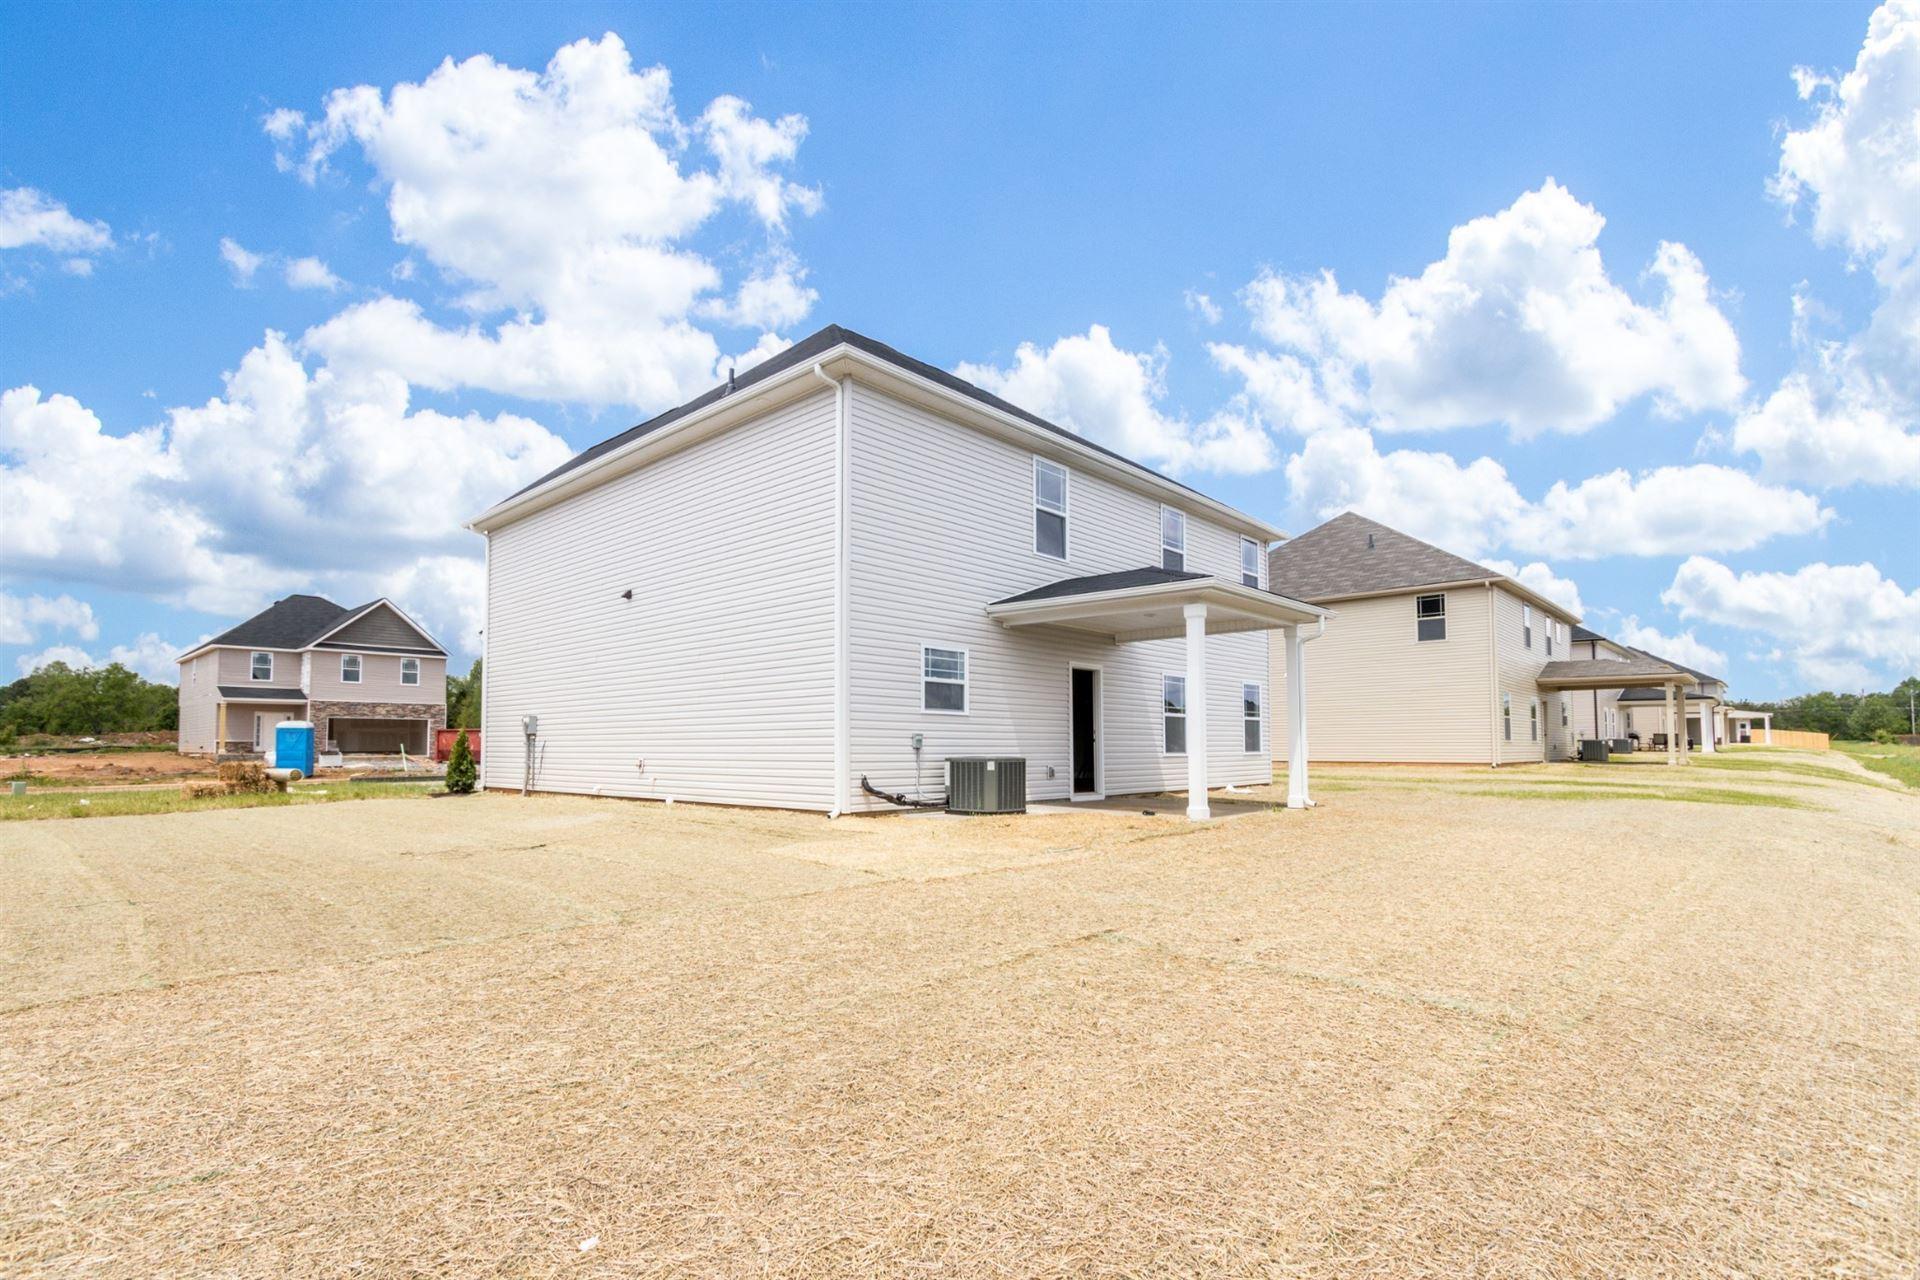 Photo of 31 Brady Estates, Murfreesboro, TN 37127 (MLS # 2153337)